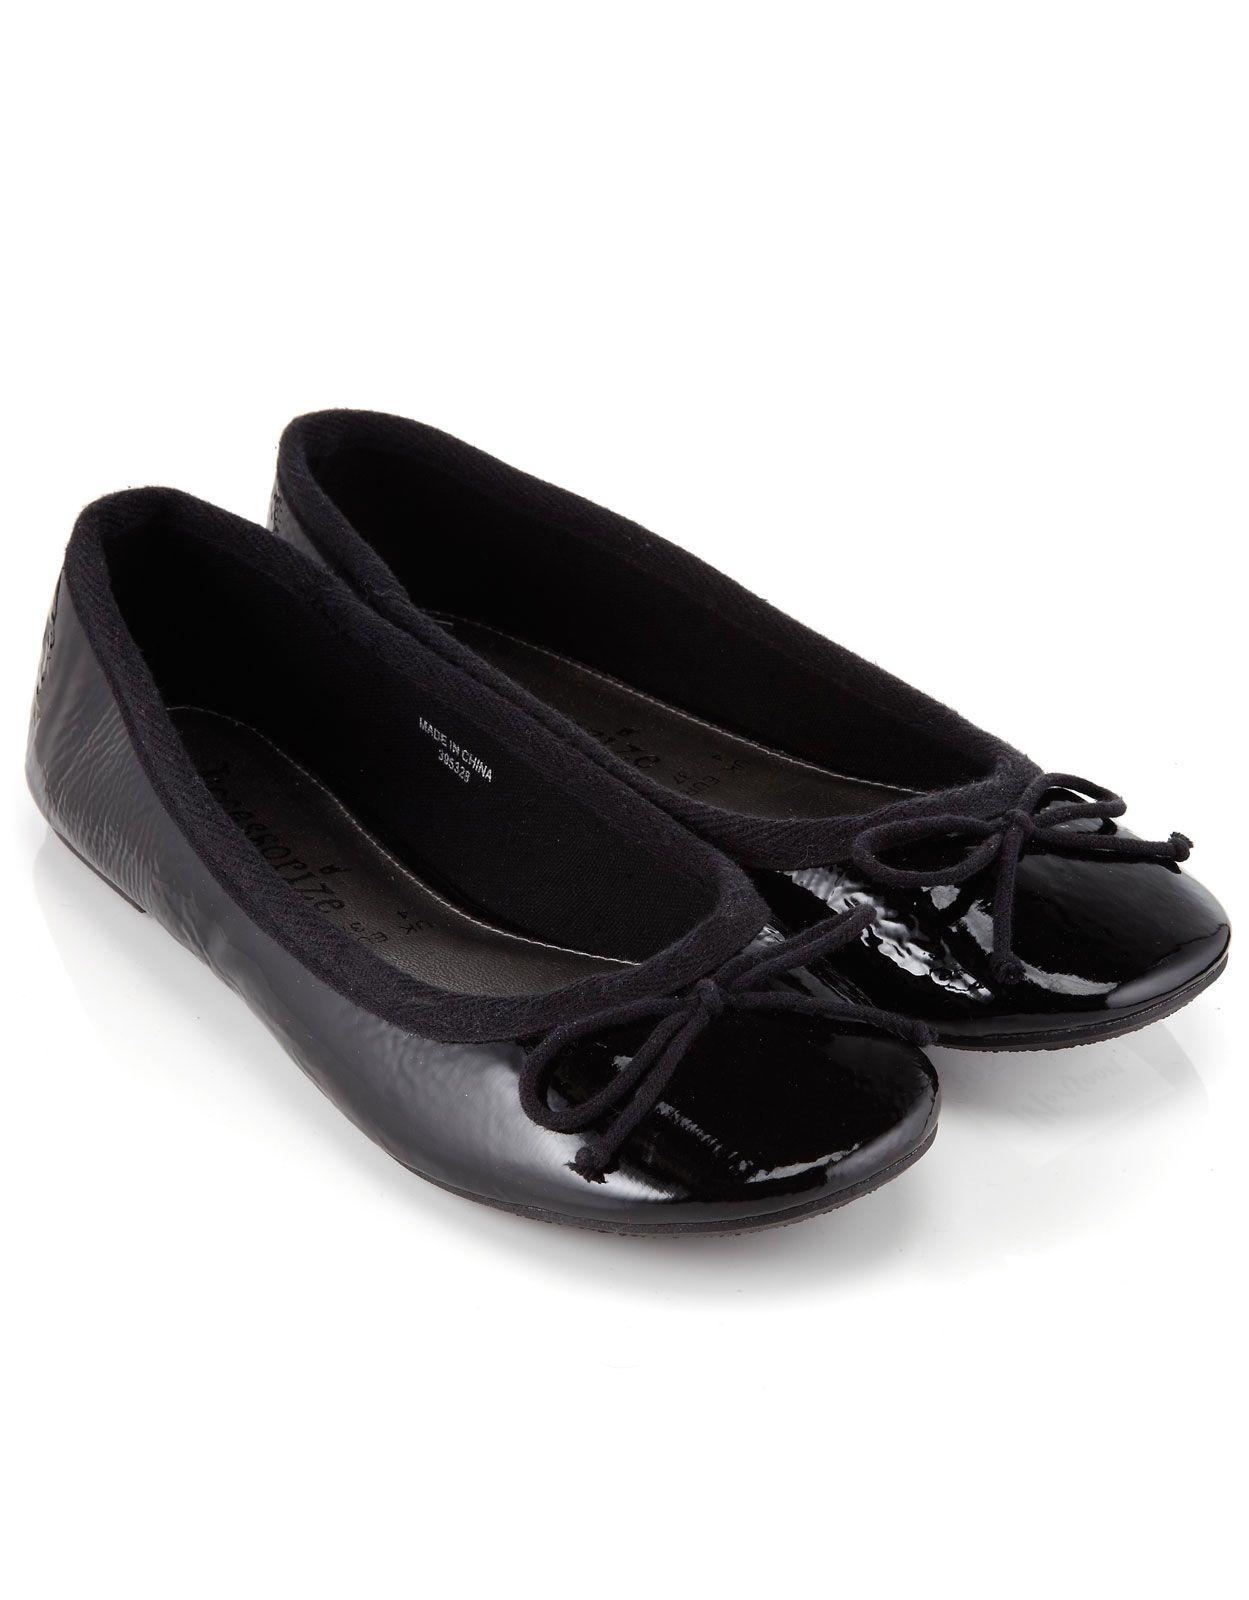 Bobbi Basic Patent Ballerina   Black